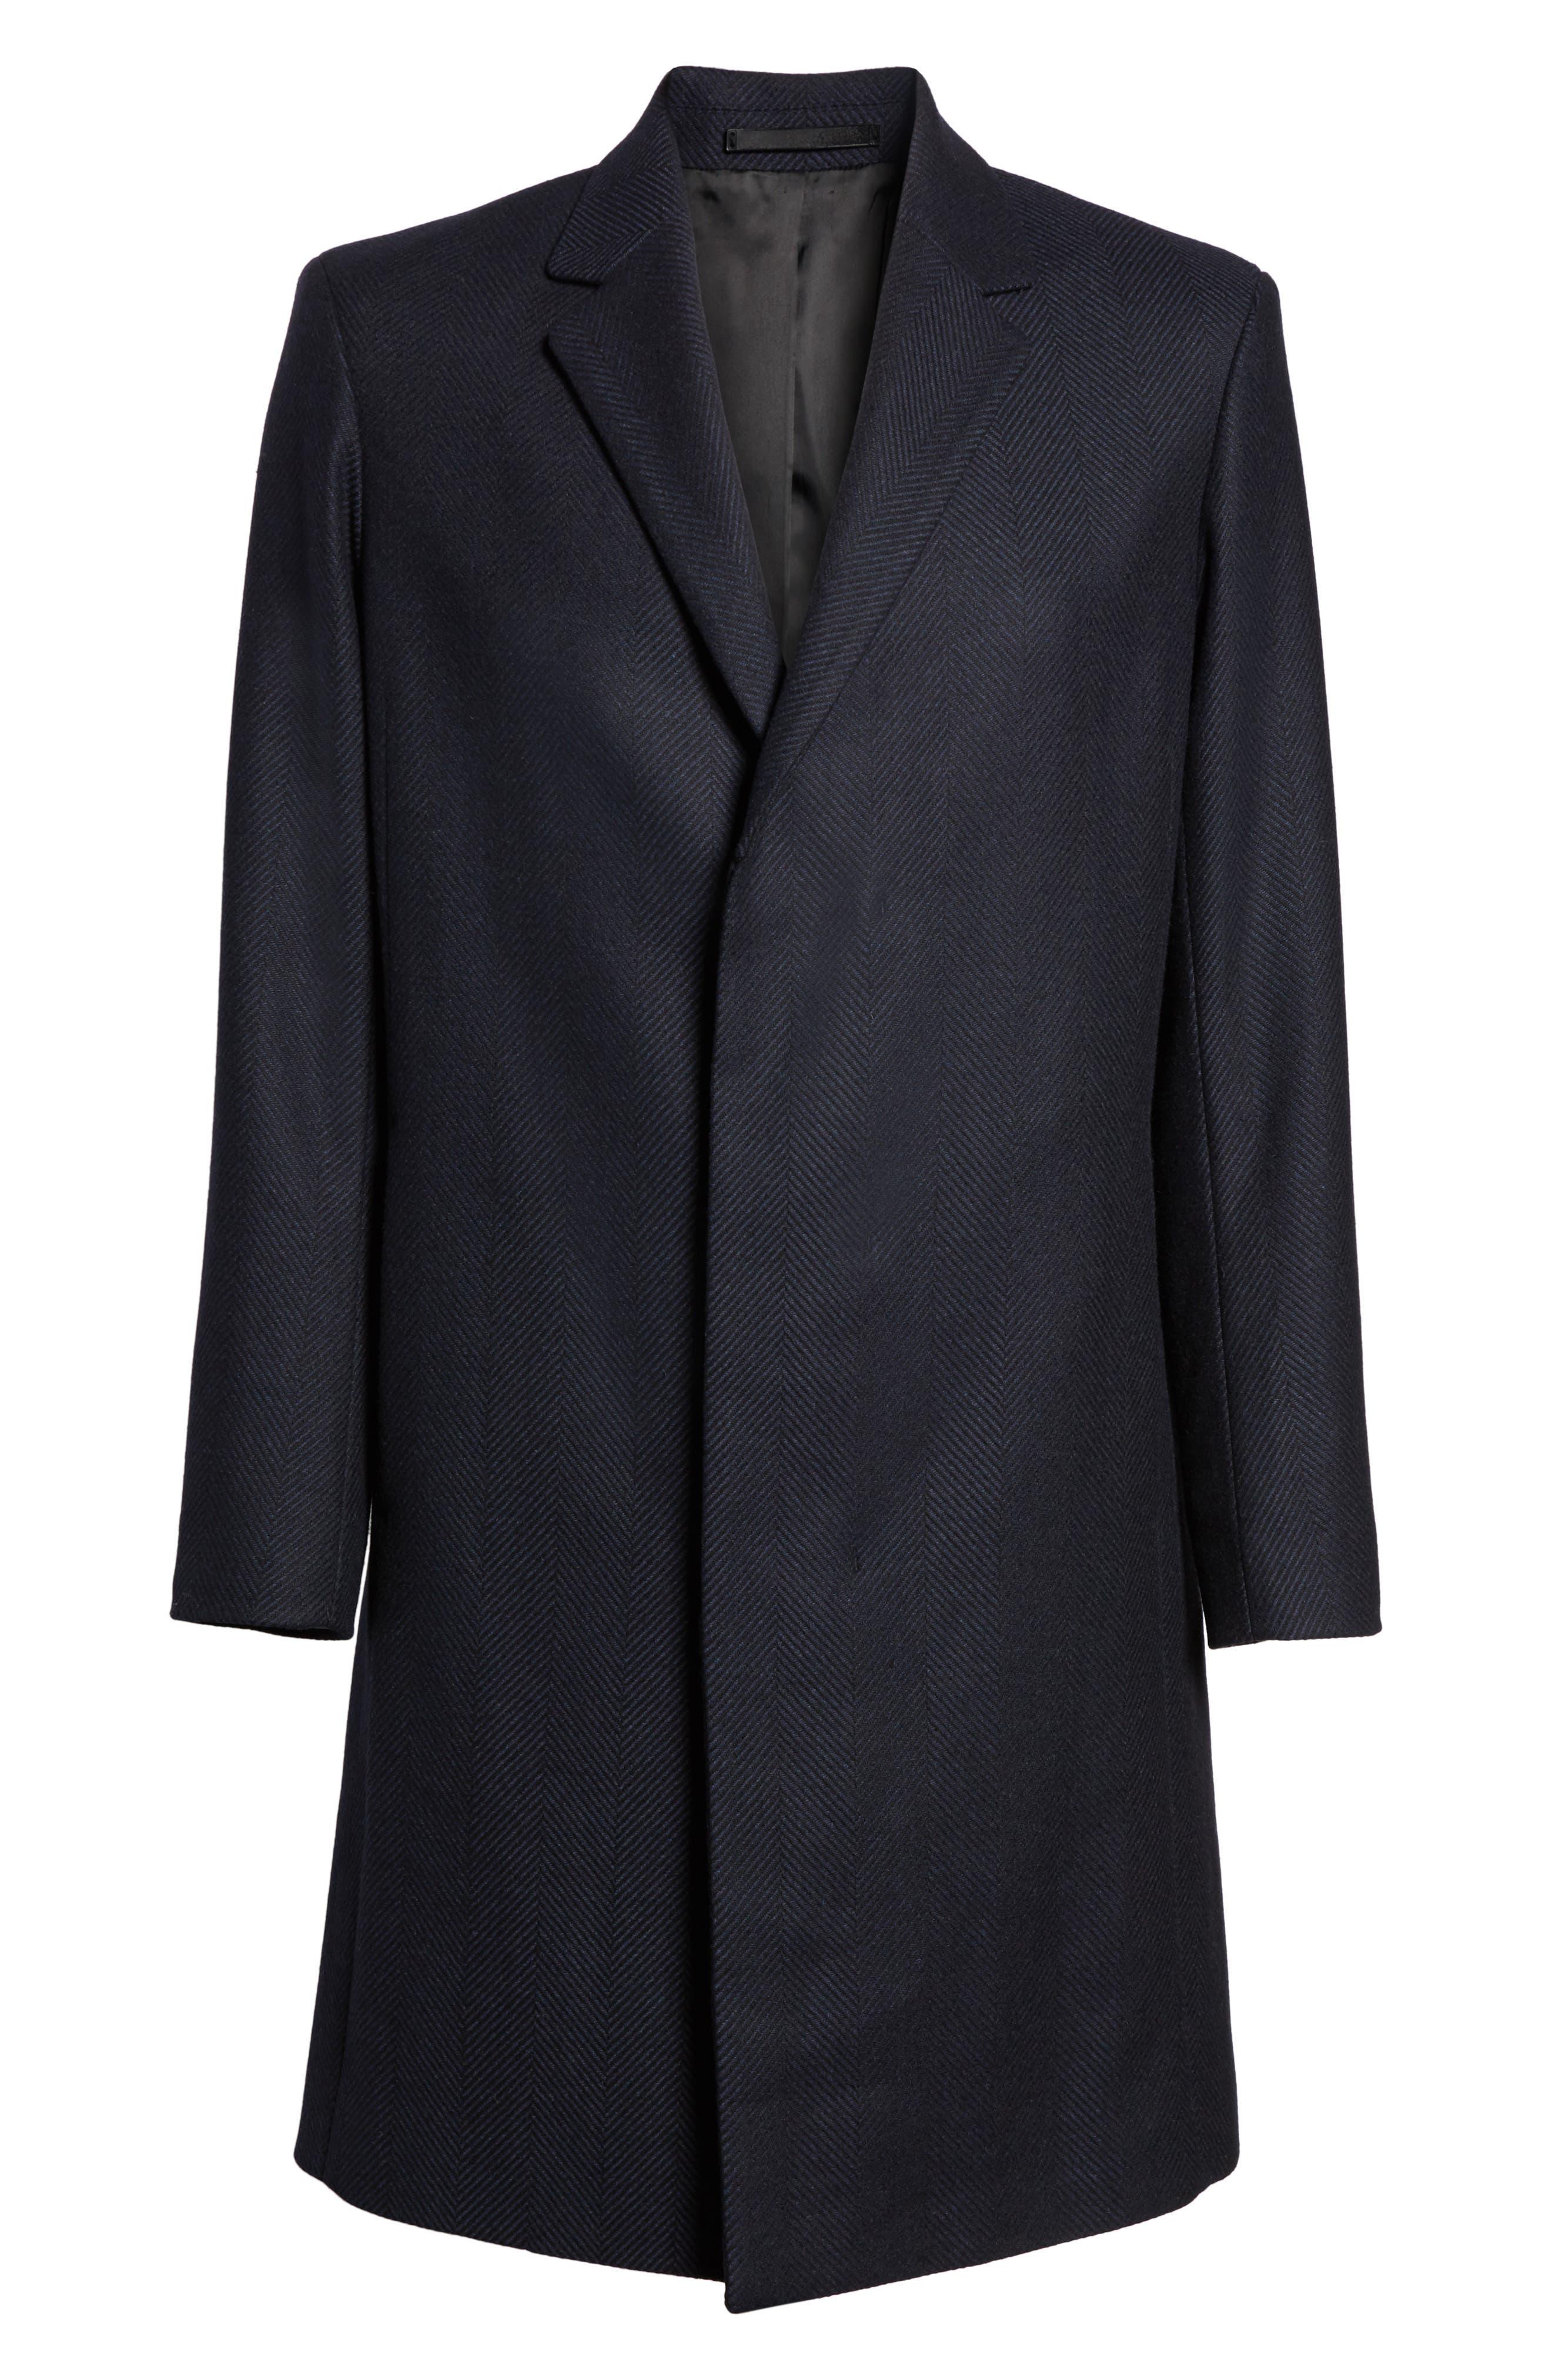 Bower Herringbone Wool Blend Topcoat,                             Alternate thumbnail 6, color,                             Liberty Multi